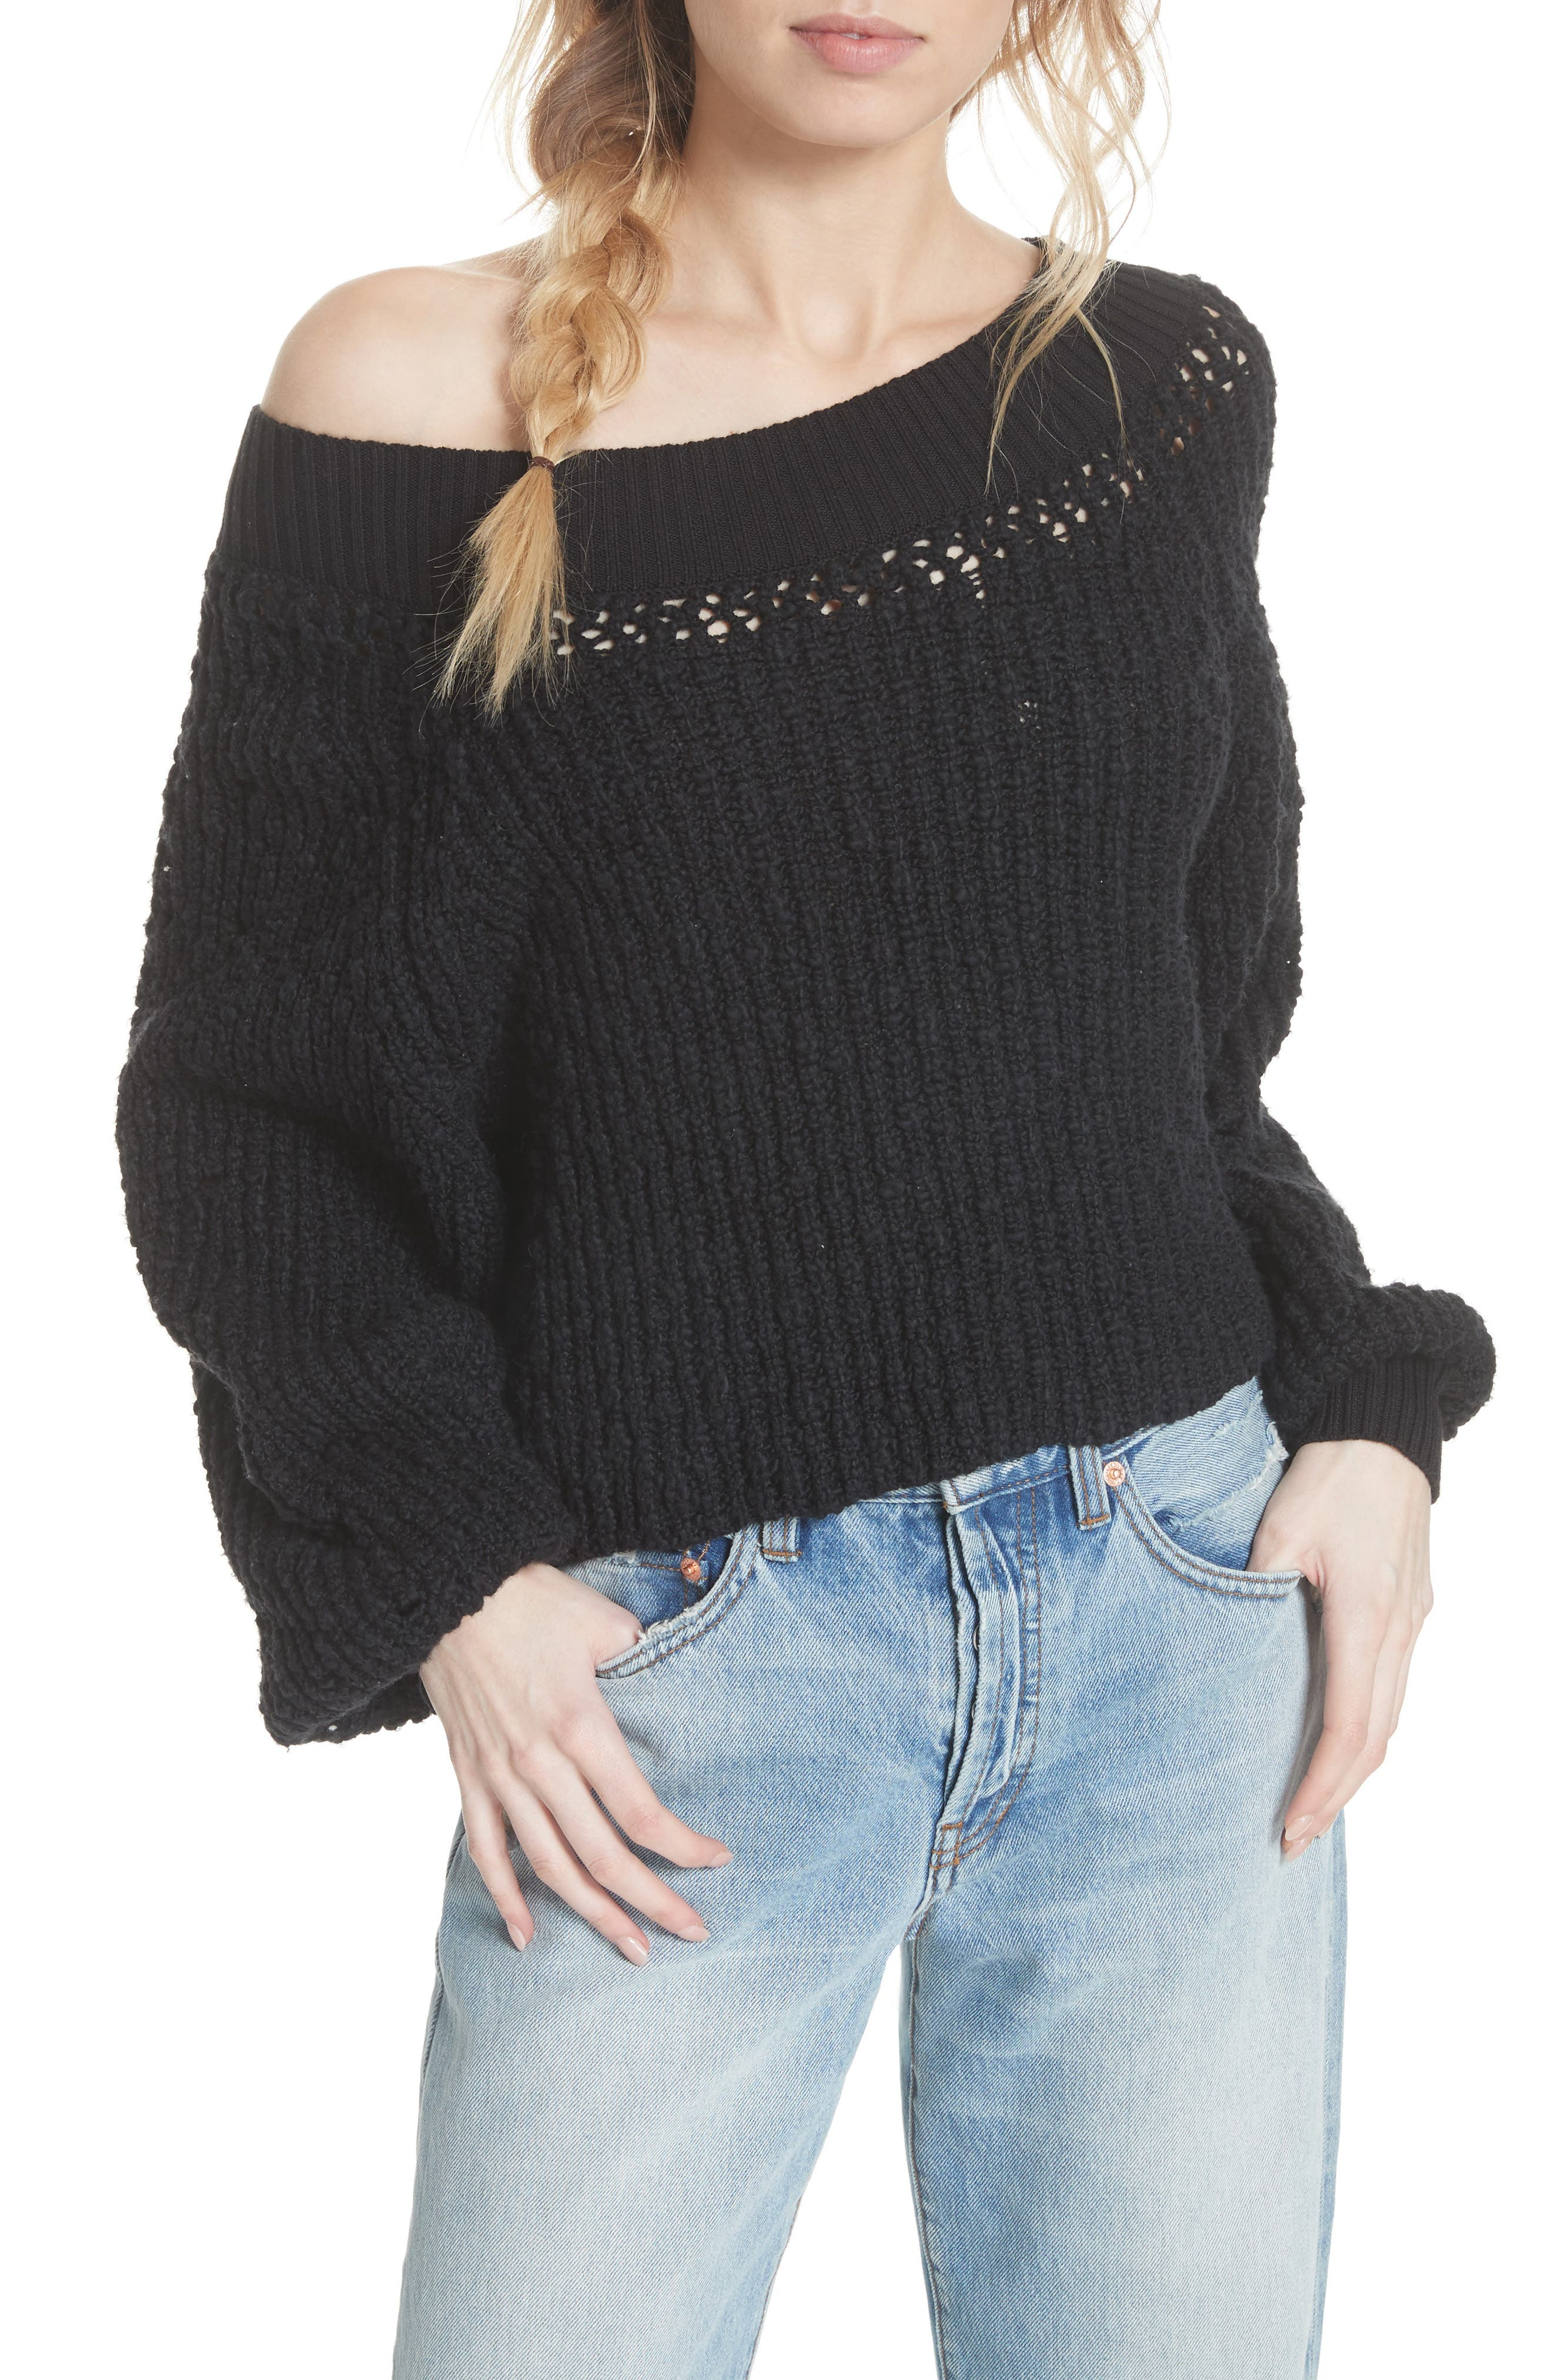 Pandora's Boatneck Sweater,                             Alternate thumbnail 2, color,                             Black